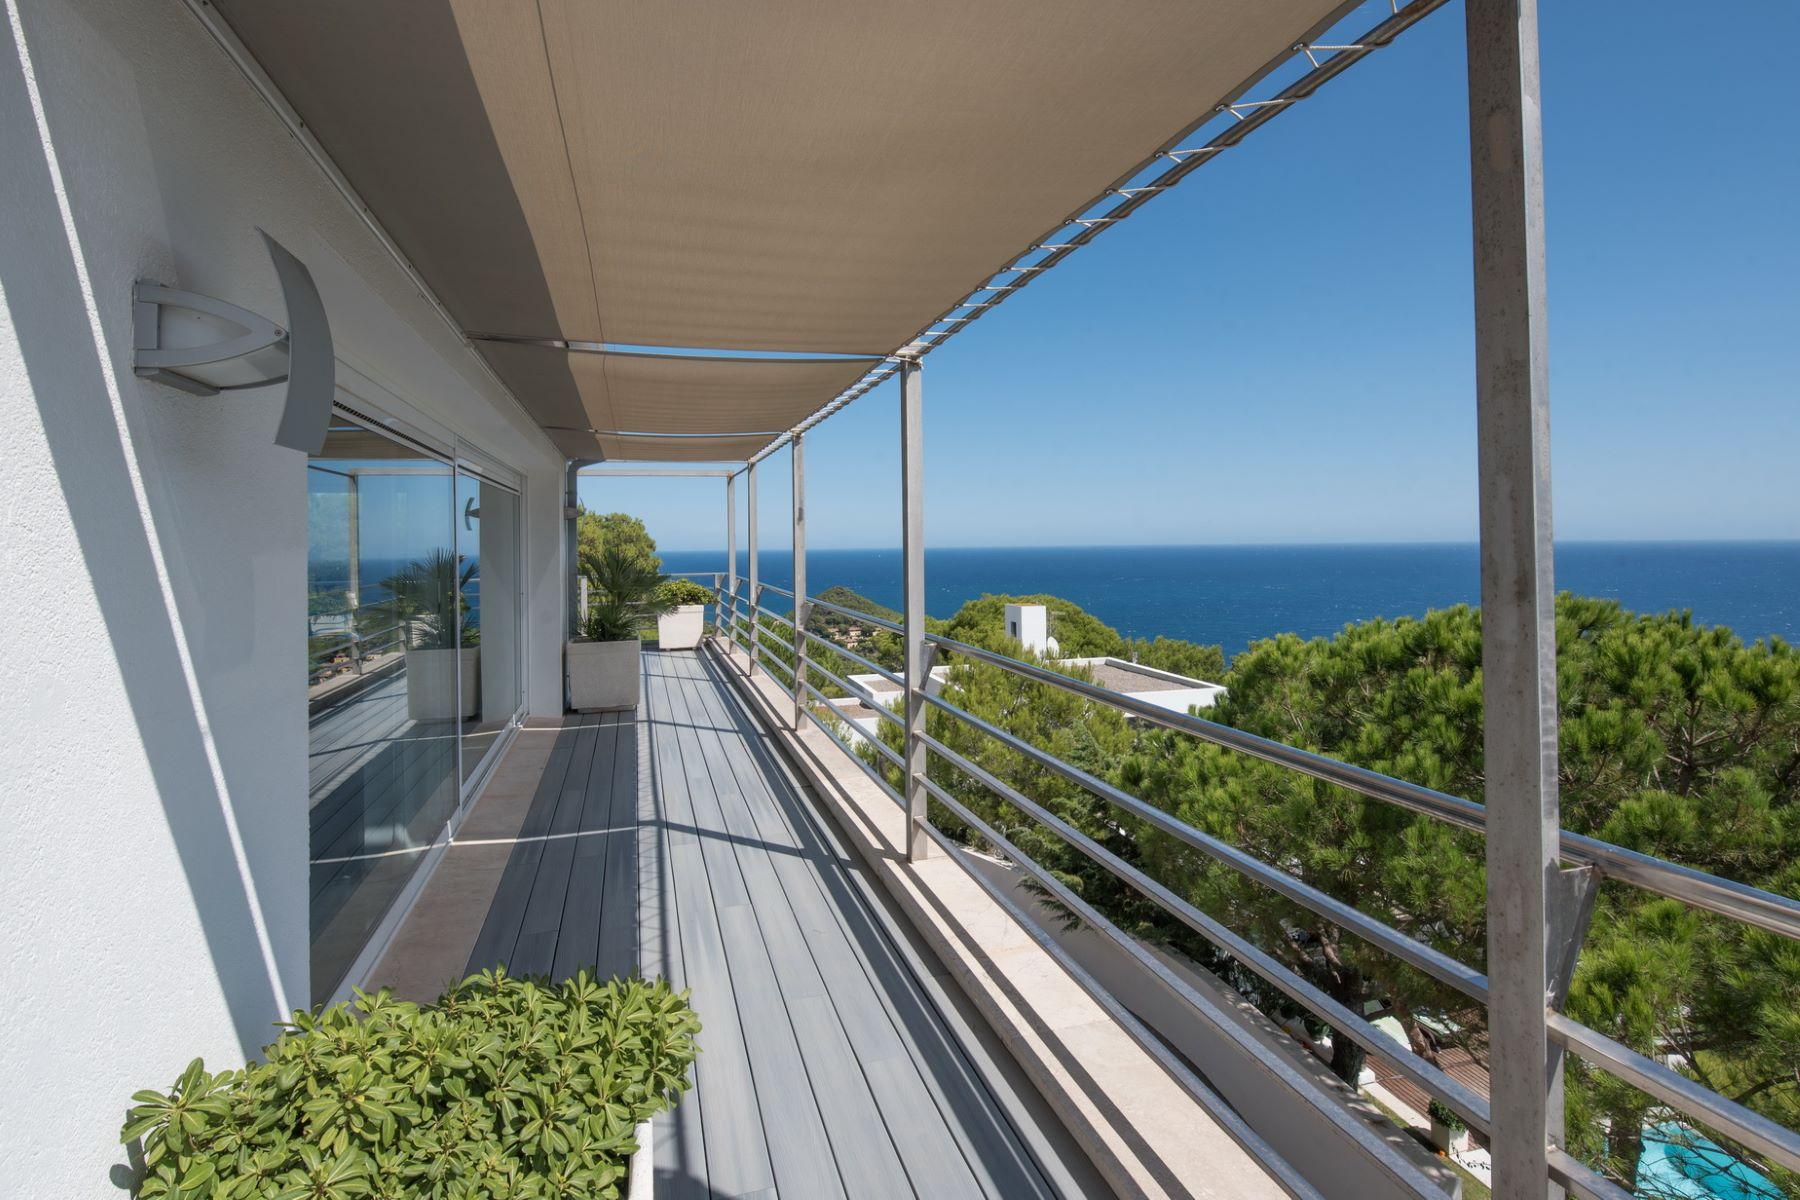 Single Family Home for Sale at Design villa close to Sa Tuna with spectacular sea views Begur, Costa Brava, 17255 Spain